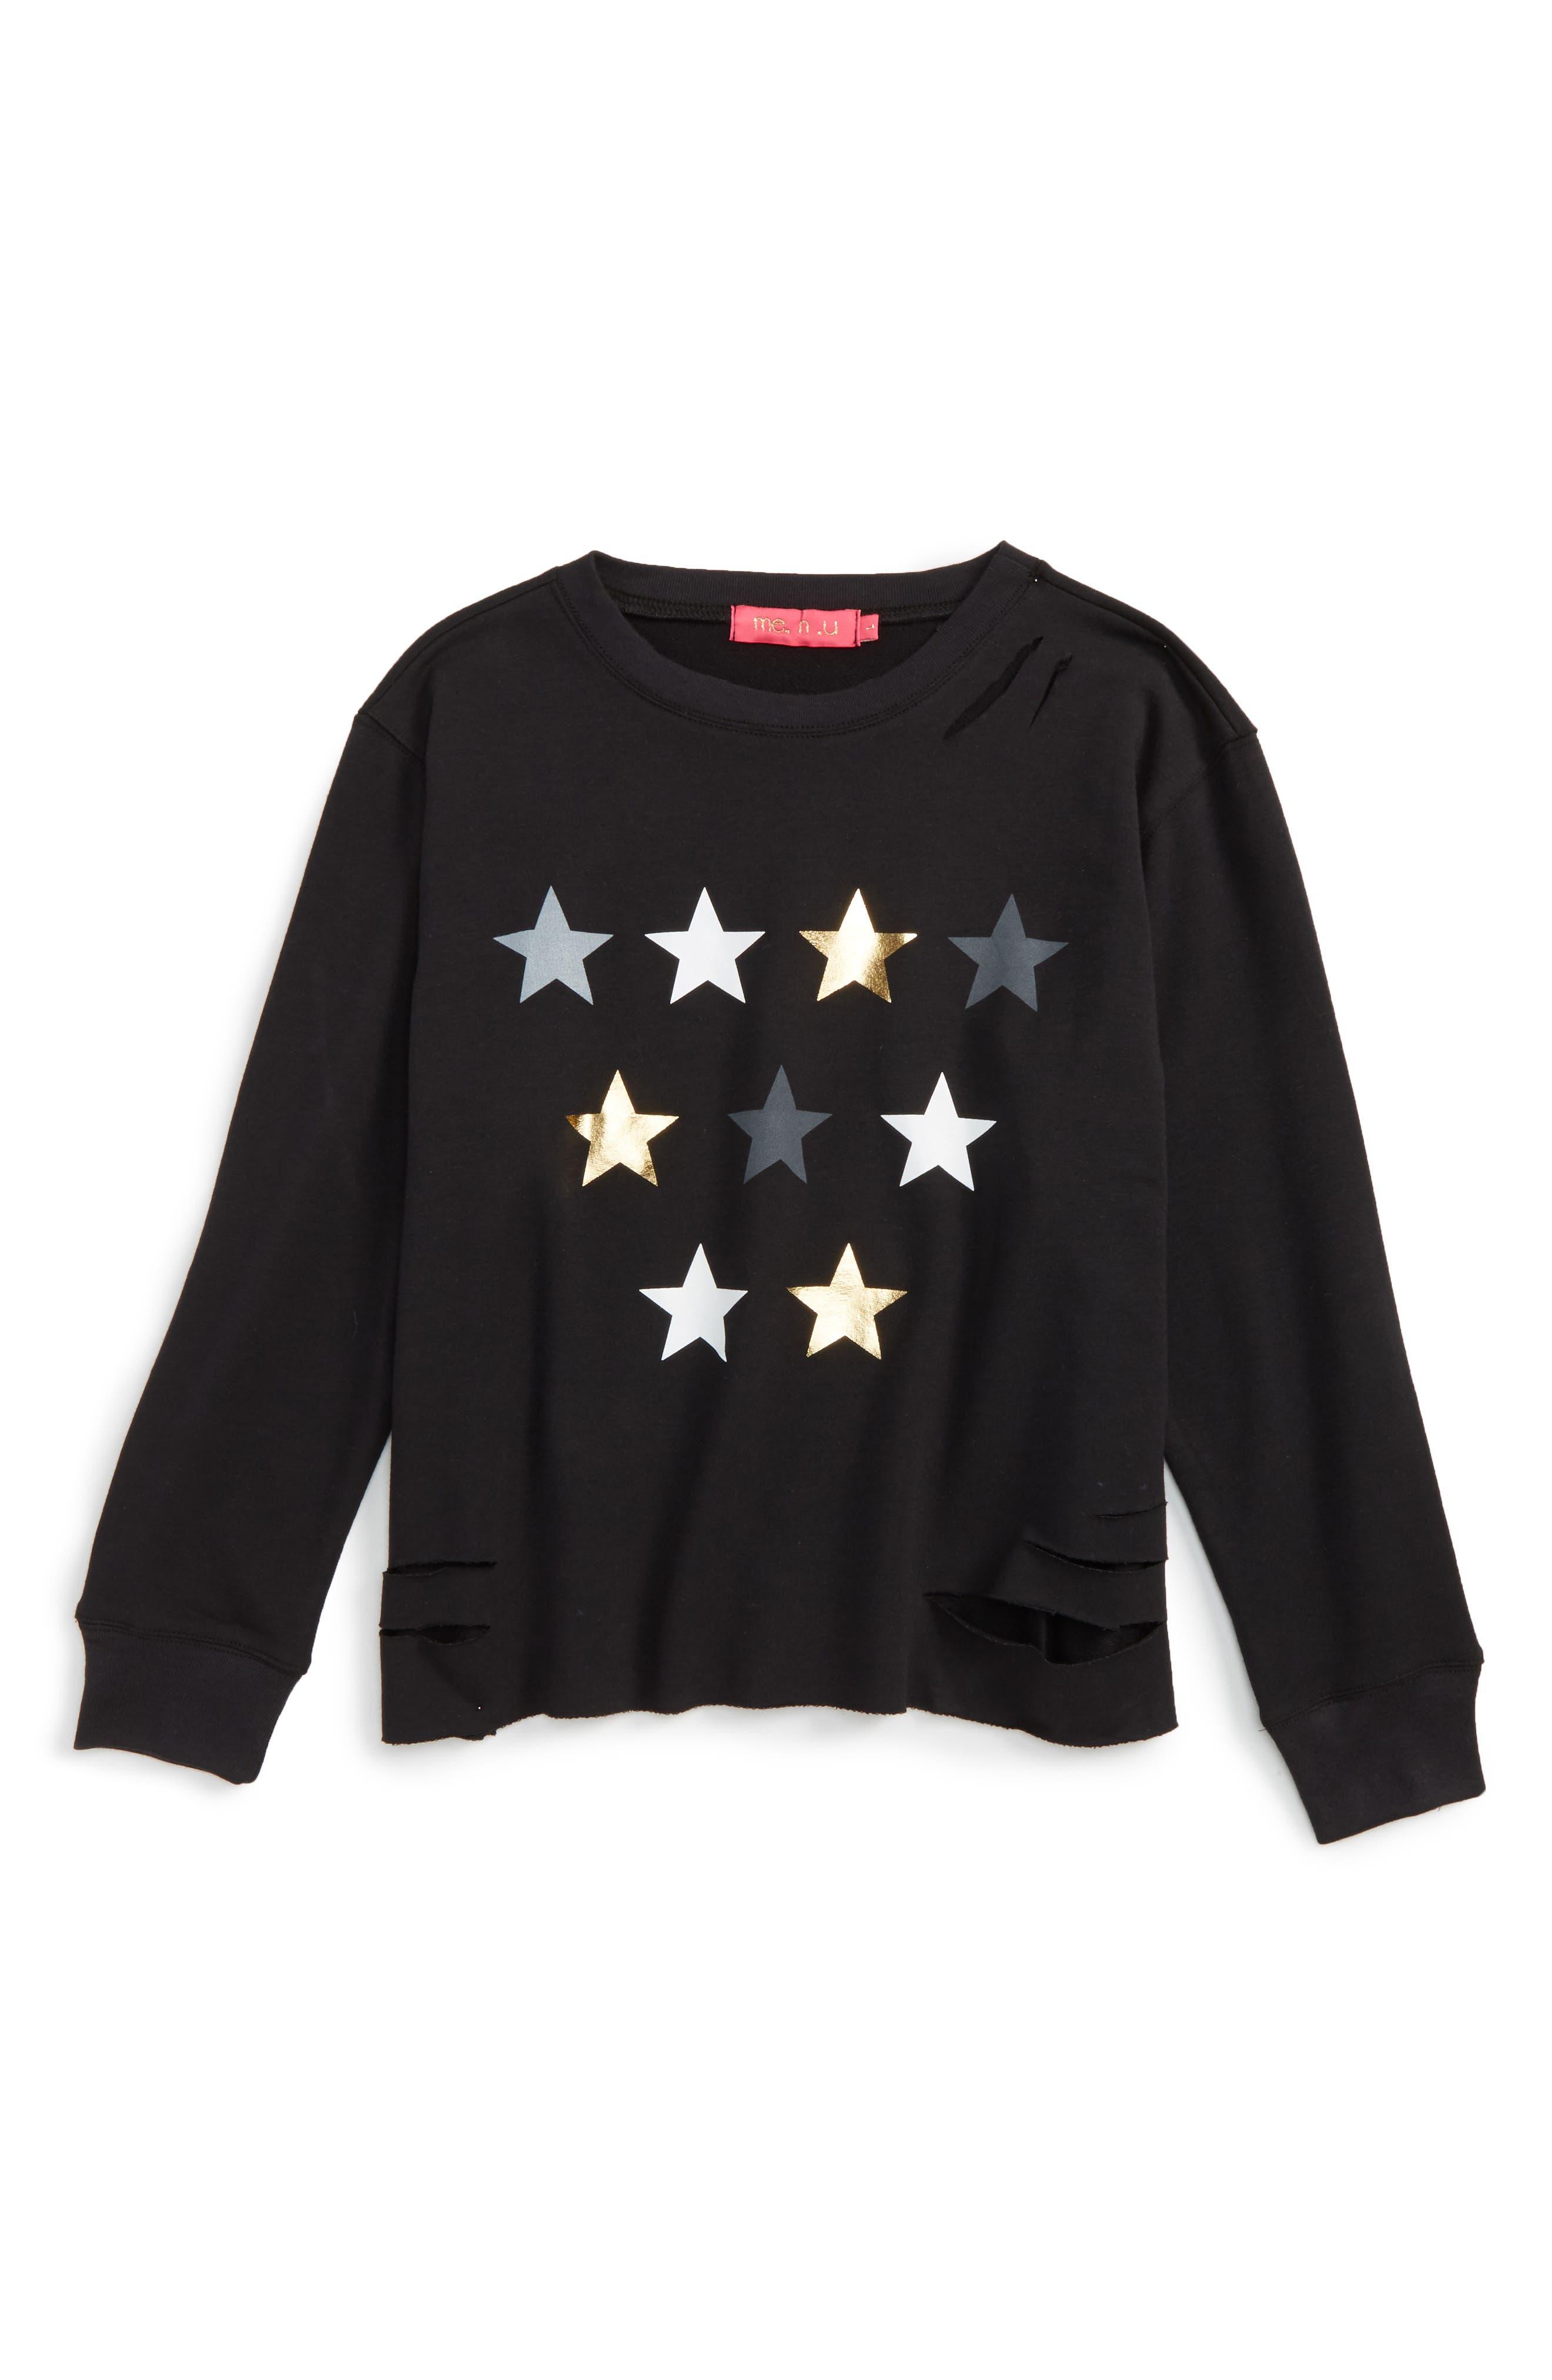 Main Image - me.n.u Star Graphic Destructed Sweatshirt (Big Girls)